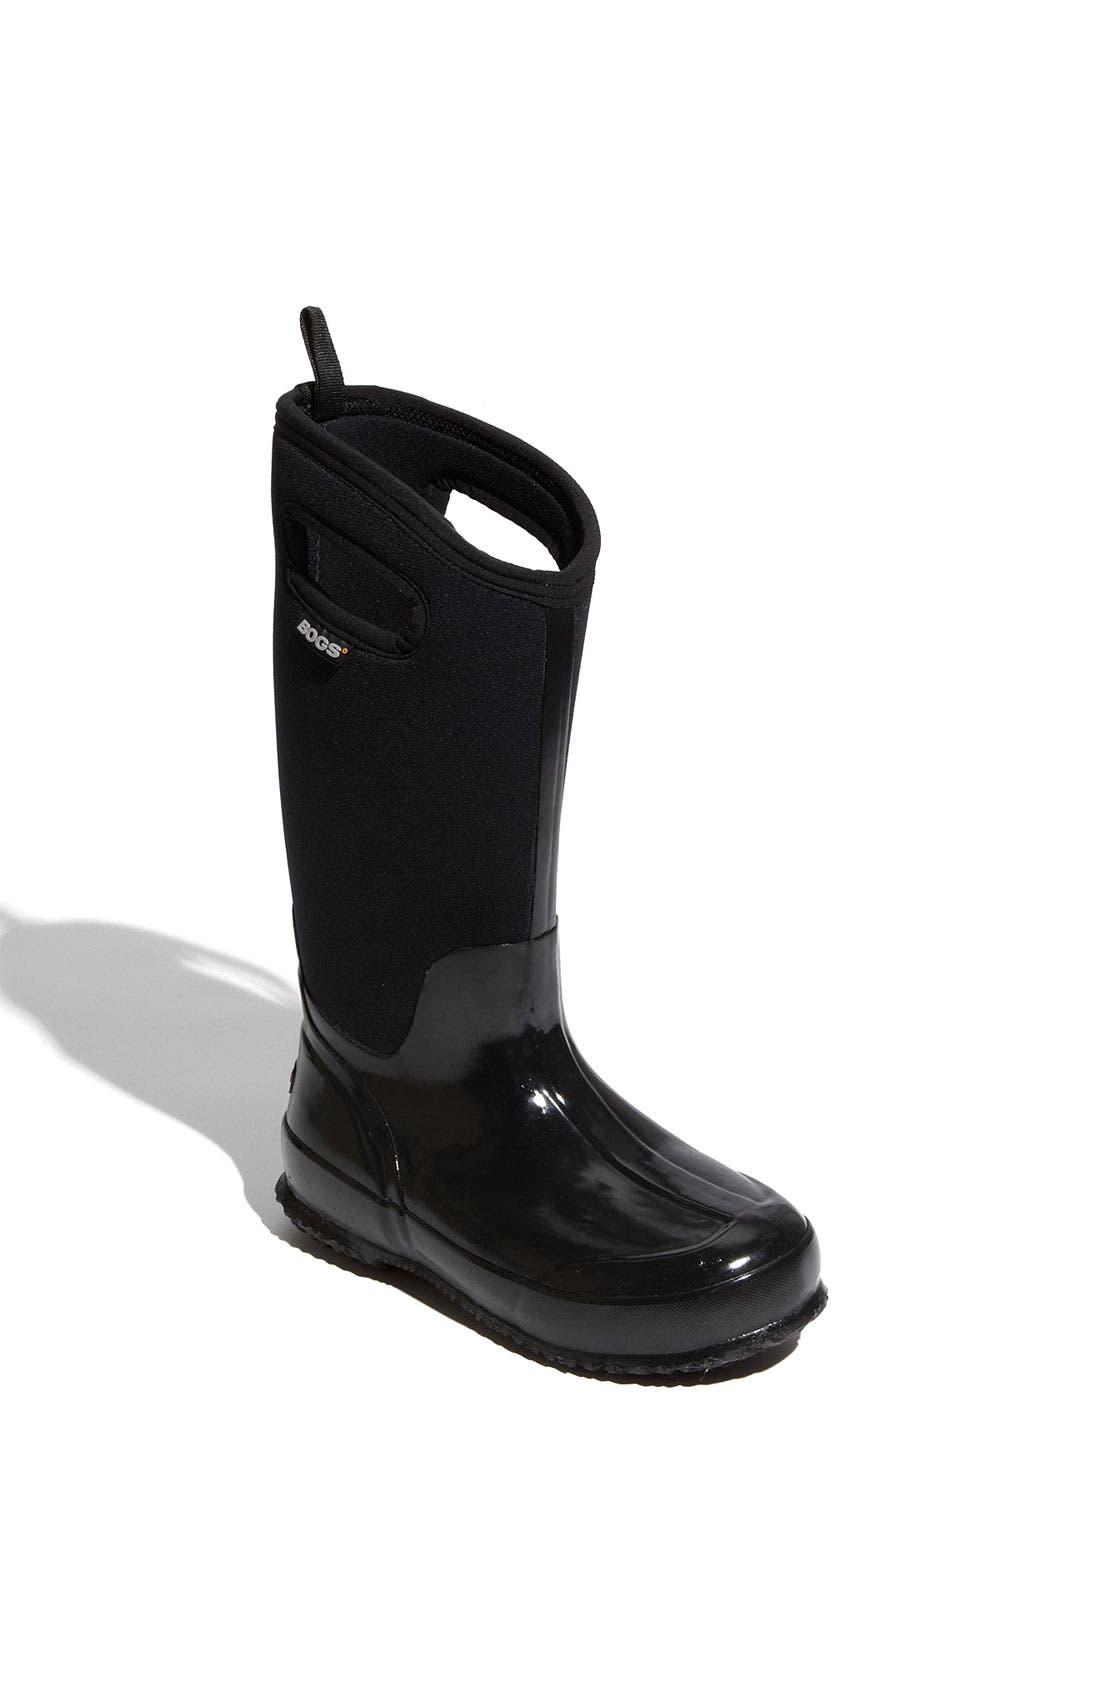 Alternate Image 1 Selected - Bogs 'Classic' Tall Rain Boot (Women)